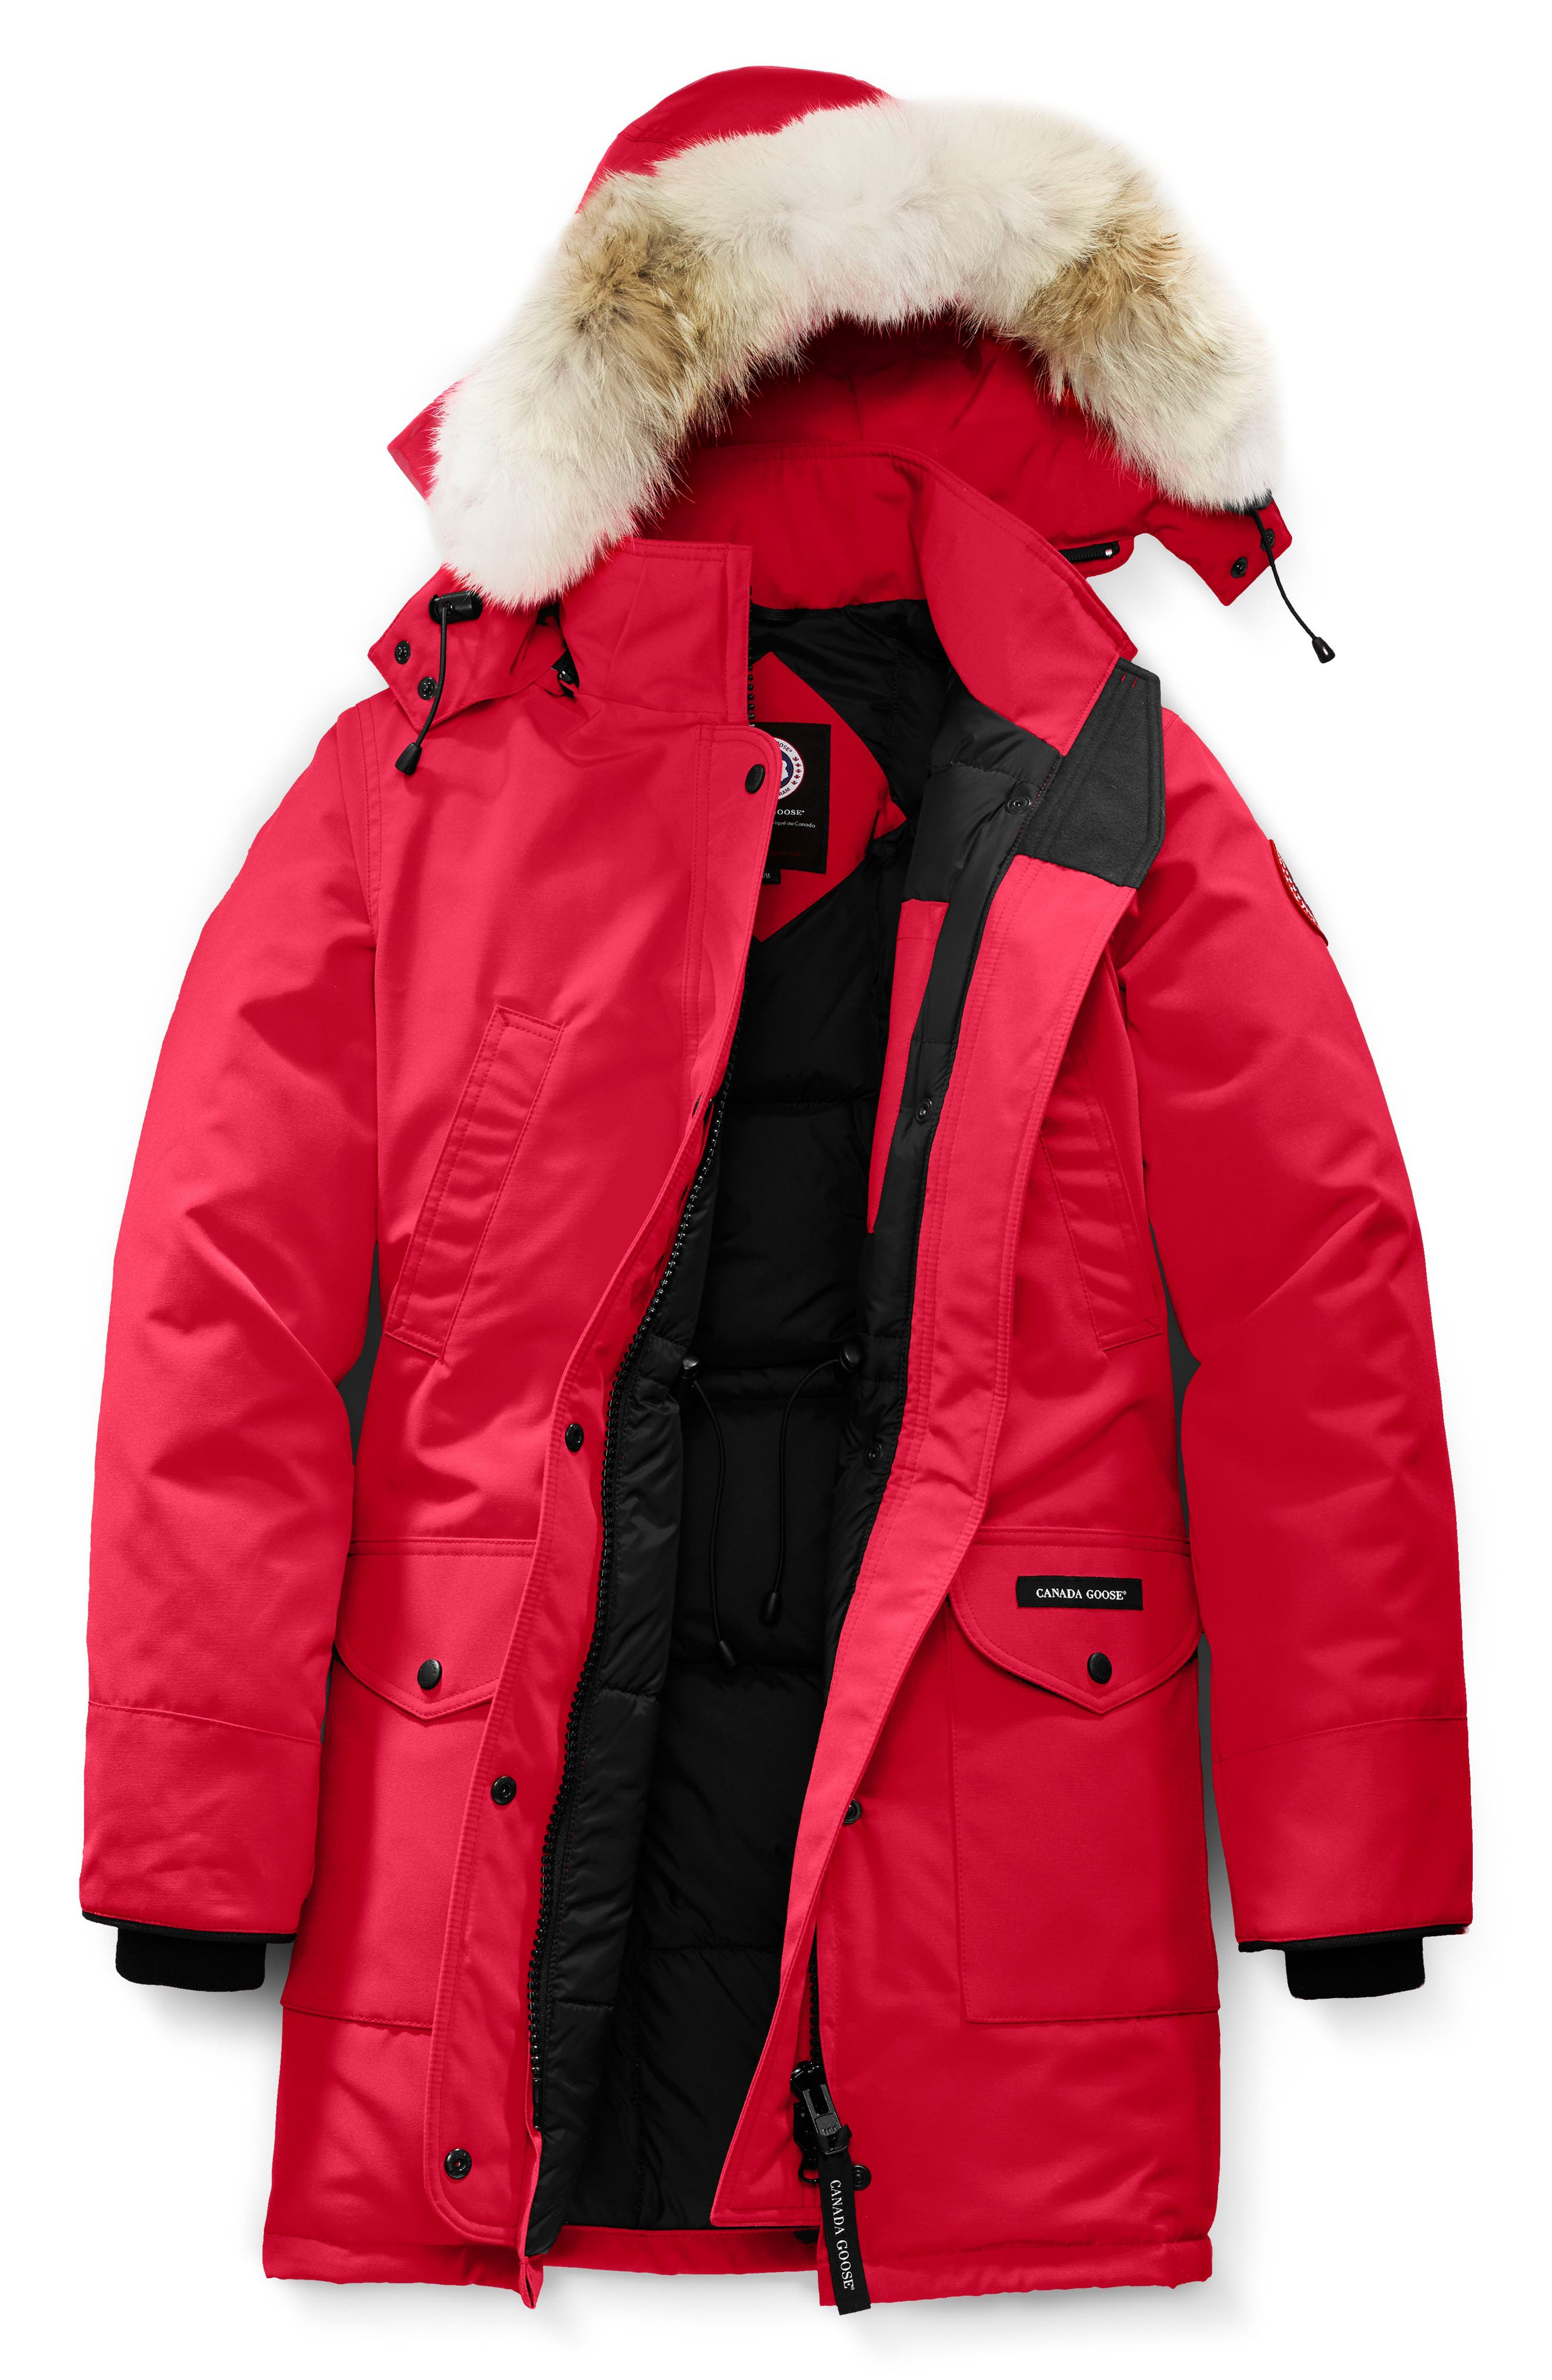 Petite Canada Goose Trillium Fusion Fit Hooded Parka With Genuine Coyote Fur Trim, (10-12) - Red